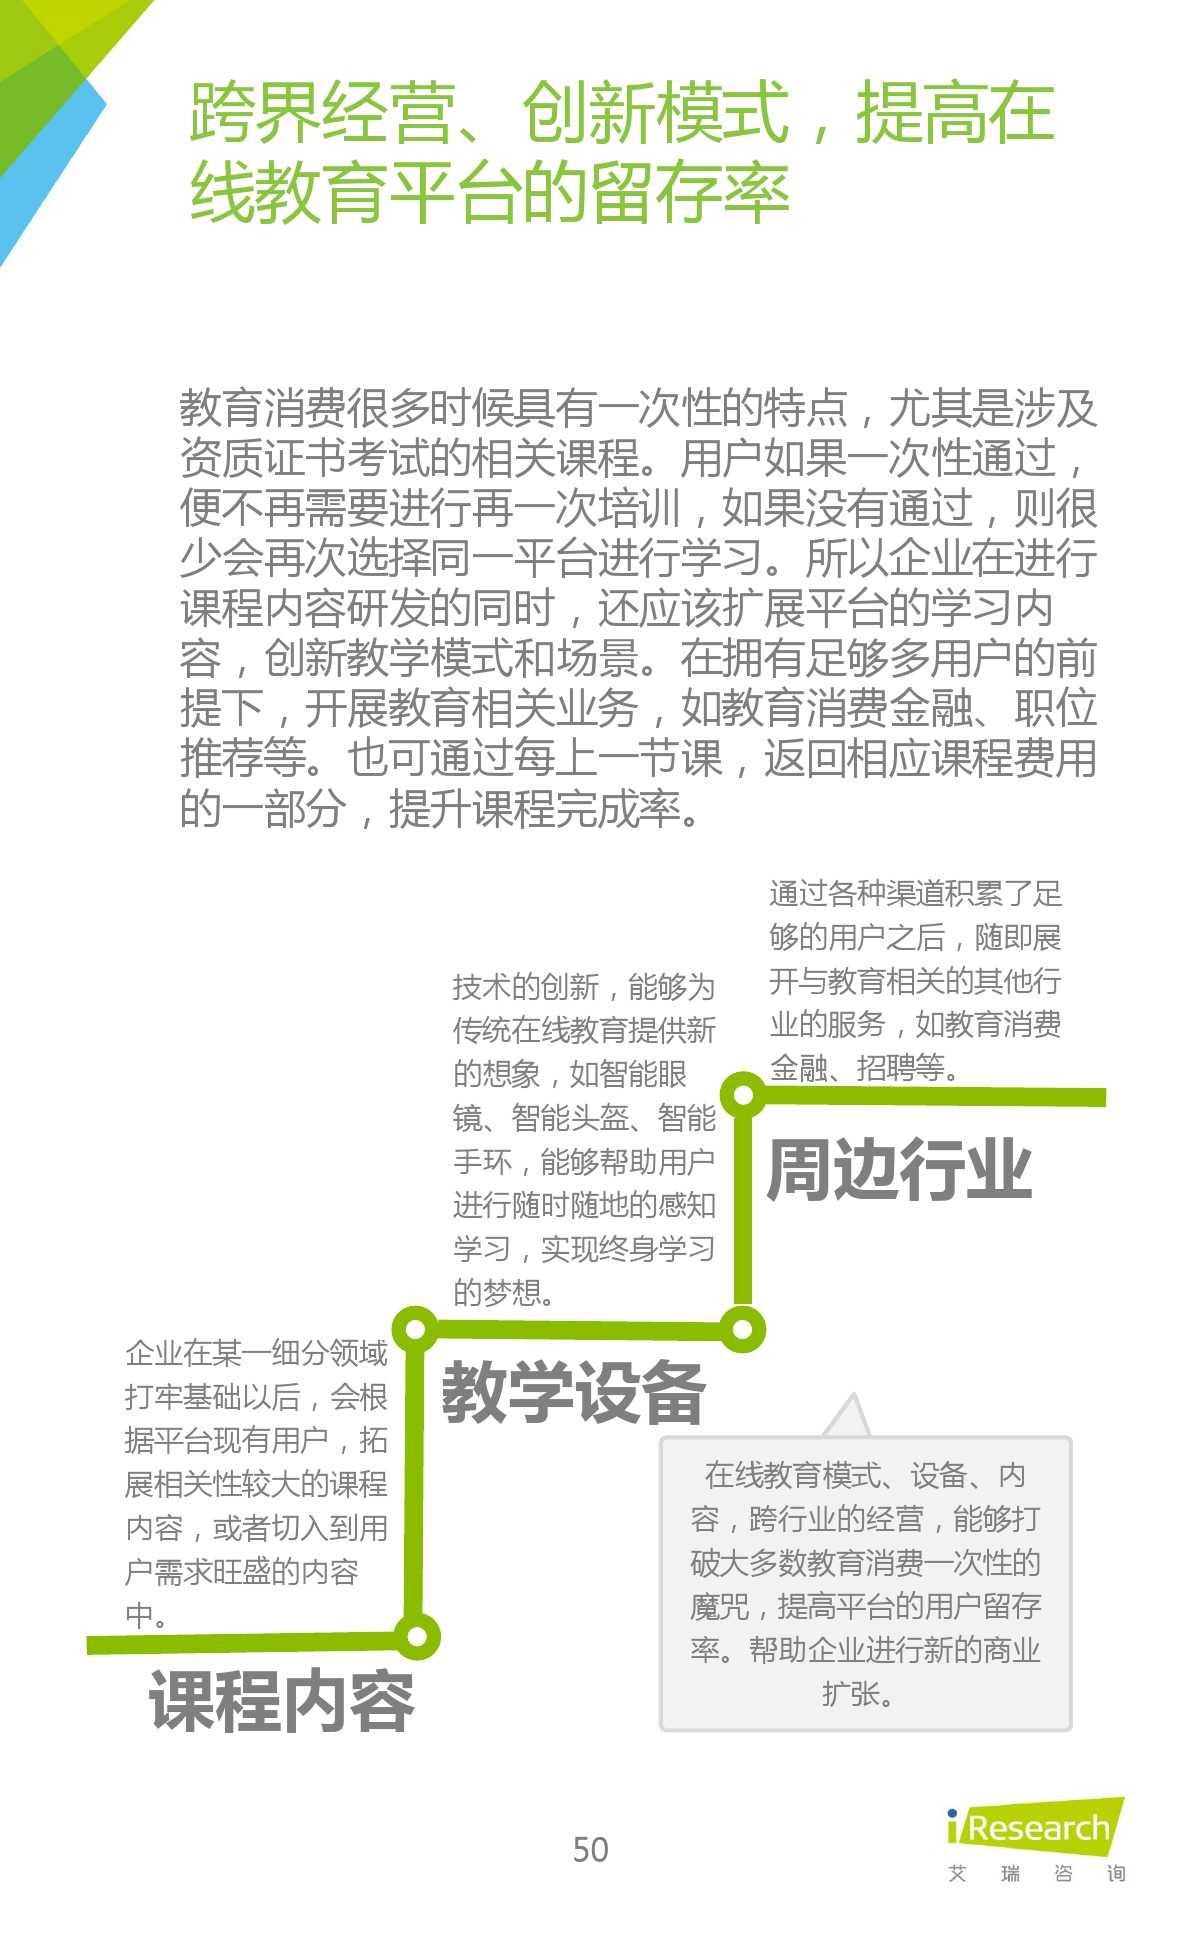 iResearch-2015年中国在线教育平台研究报告_000050